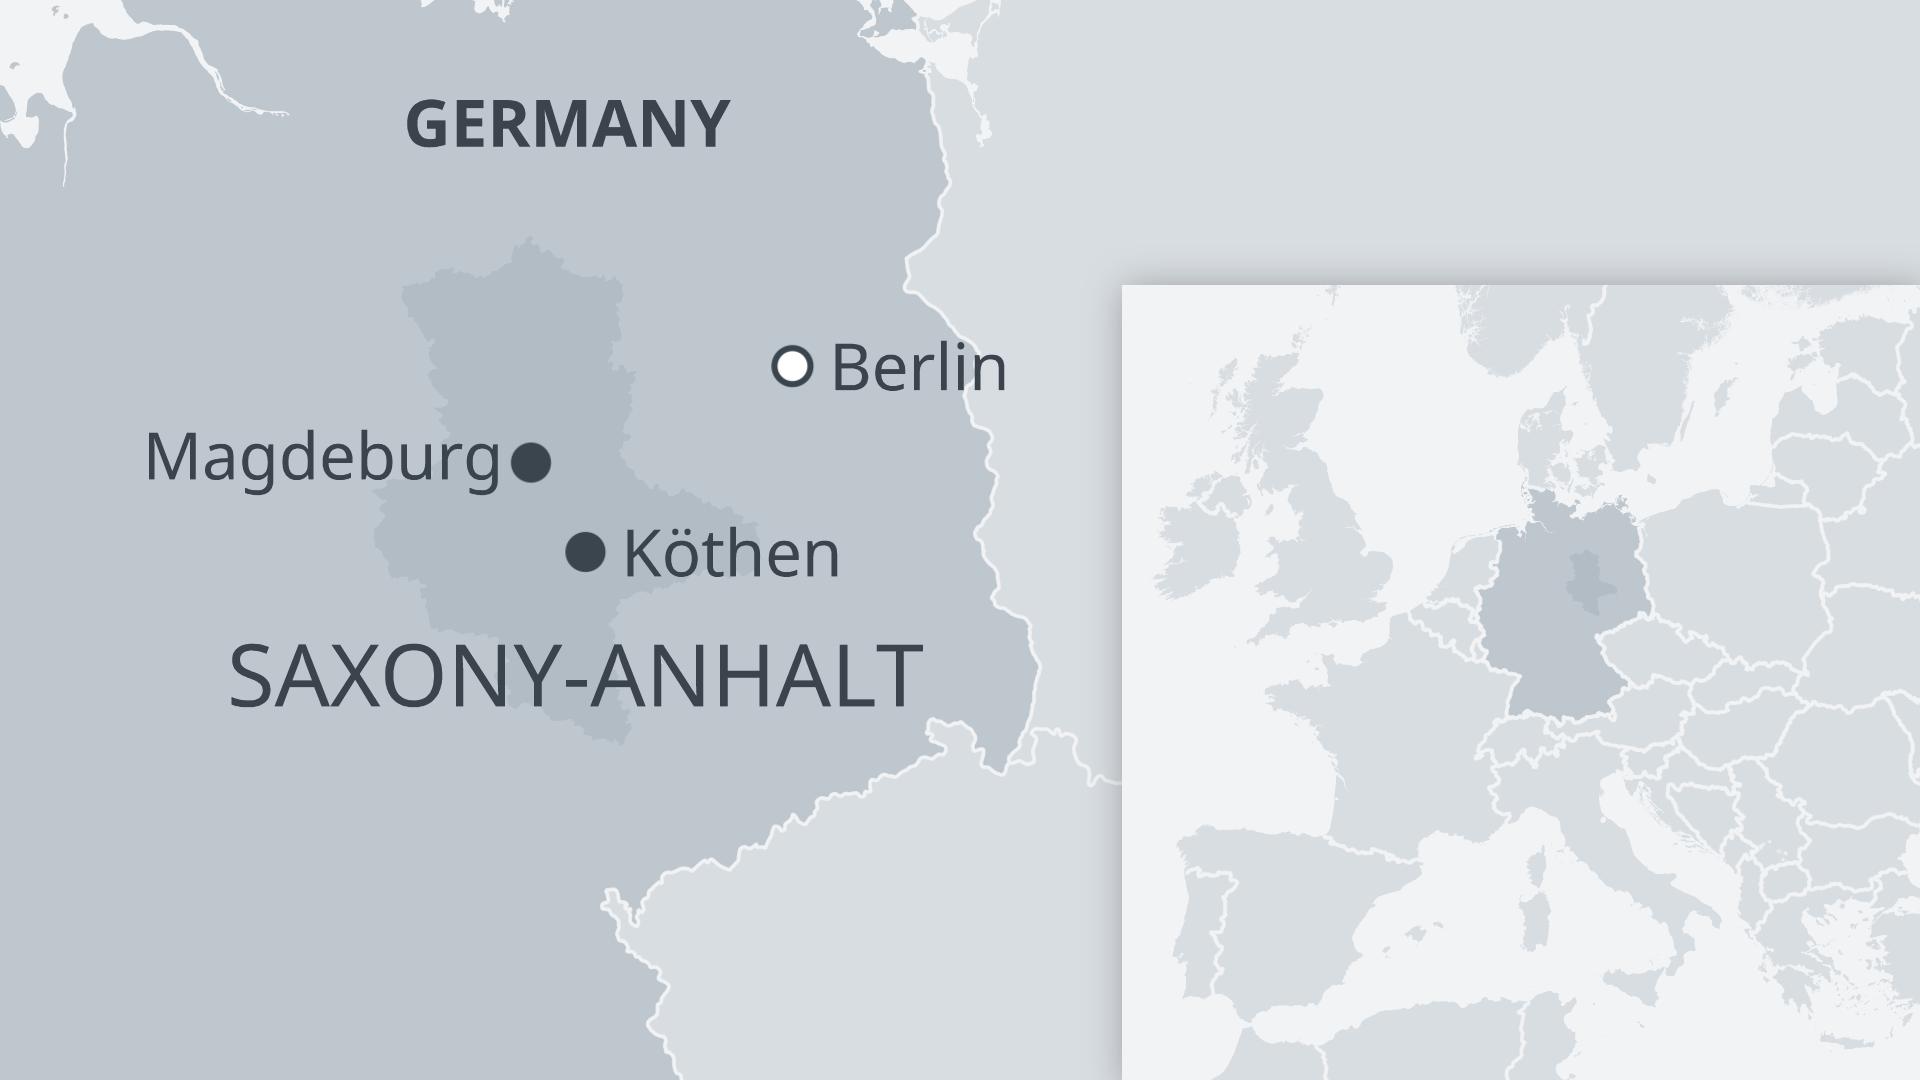 Köthen lies around 160 km southwest of Berlin